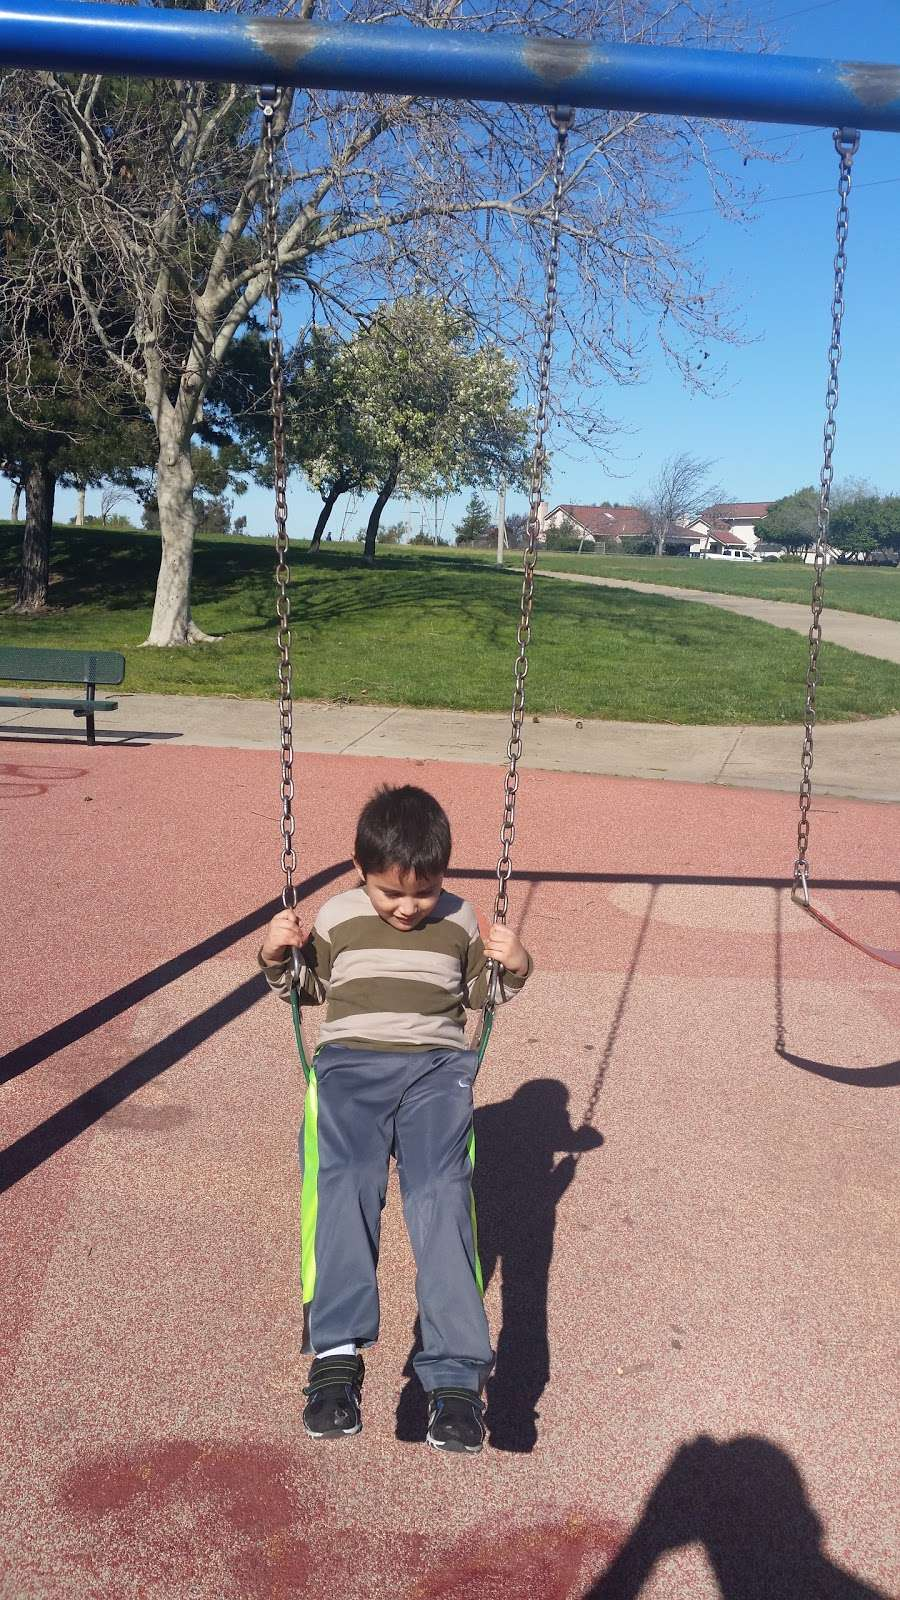 Almondridge Park - park  | Photo 5 of 10 | Address: 3400 Almondridge Dr, Antioch, CA 94509, USA | Phone: (925) 779-6950